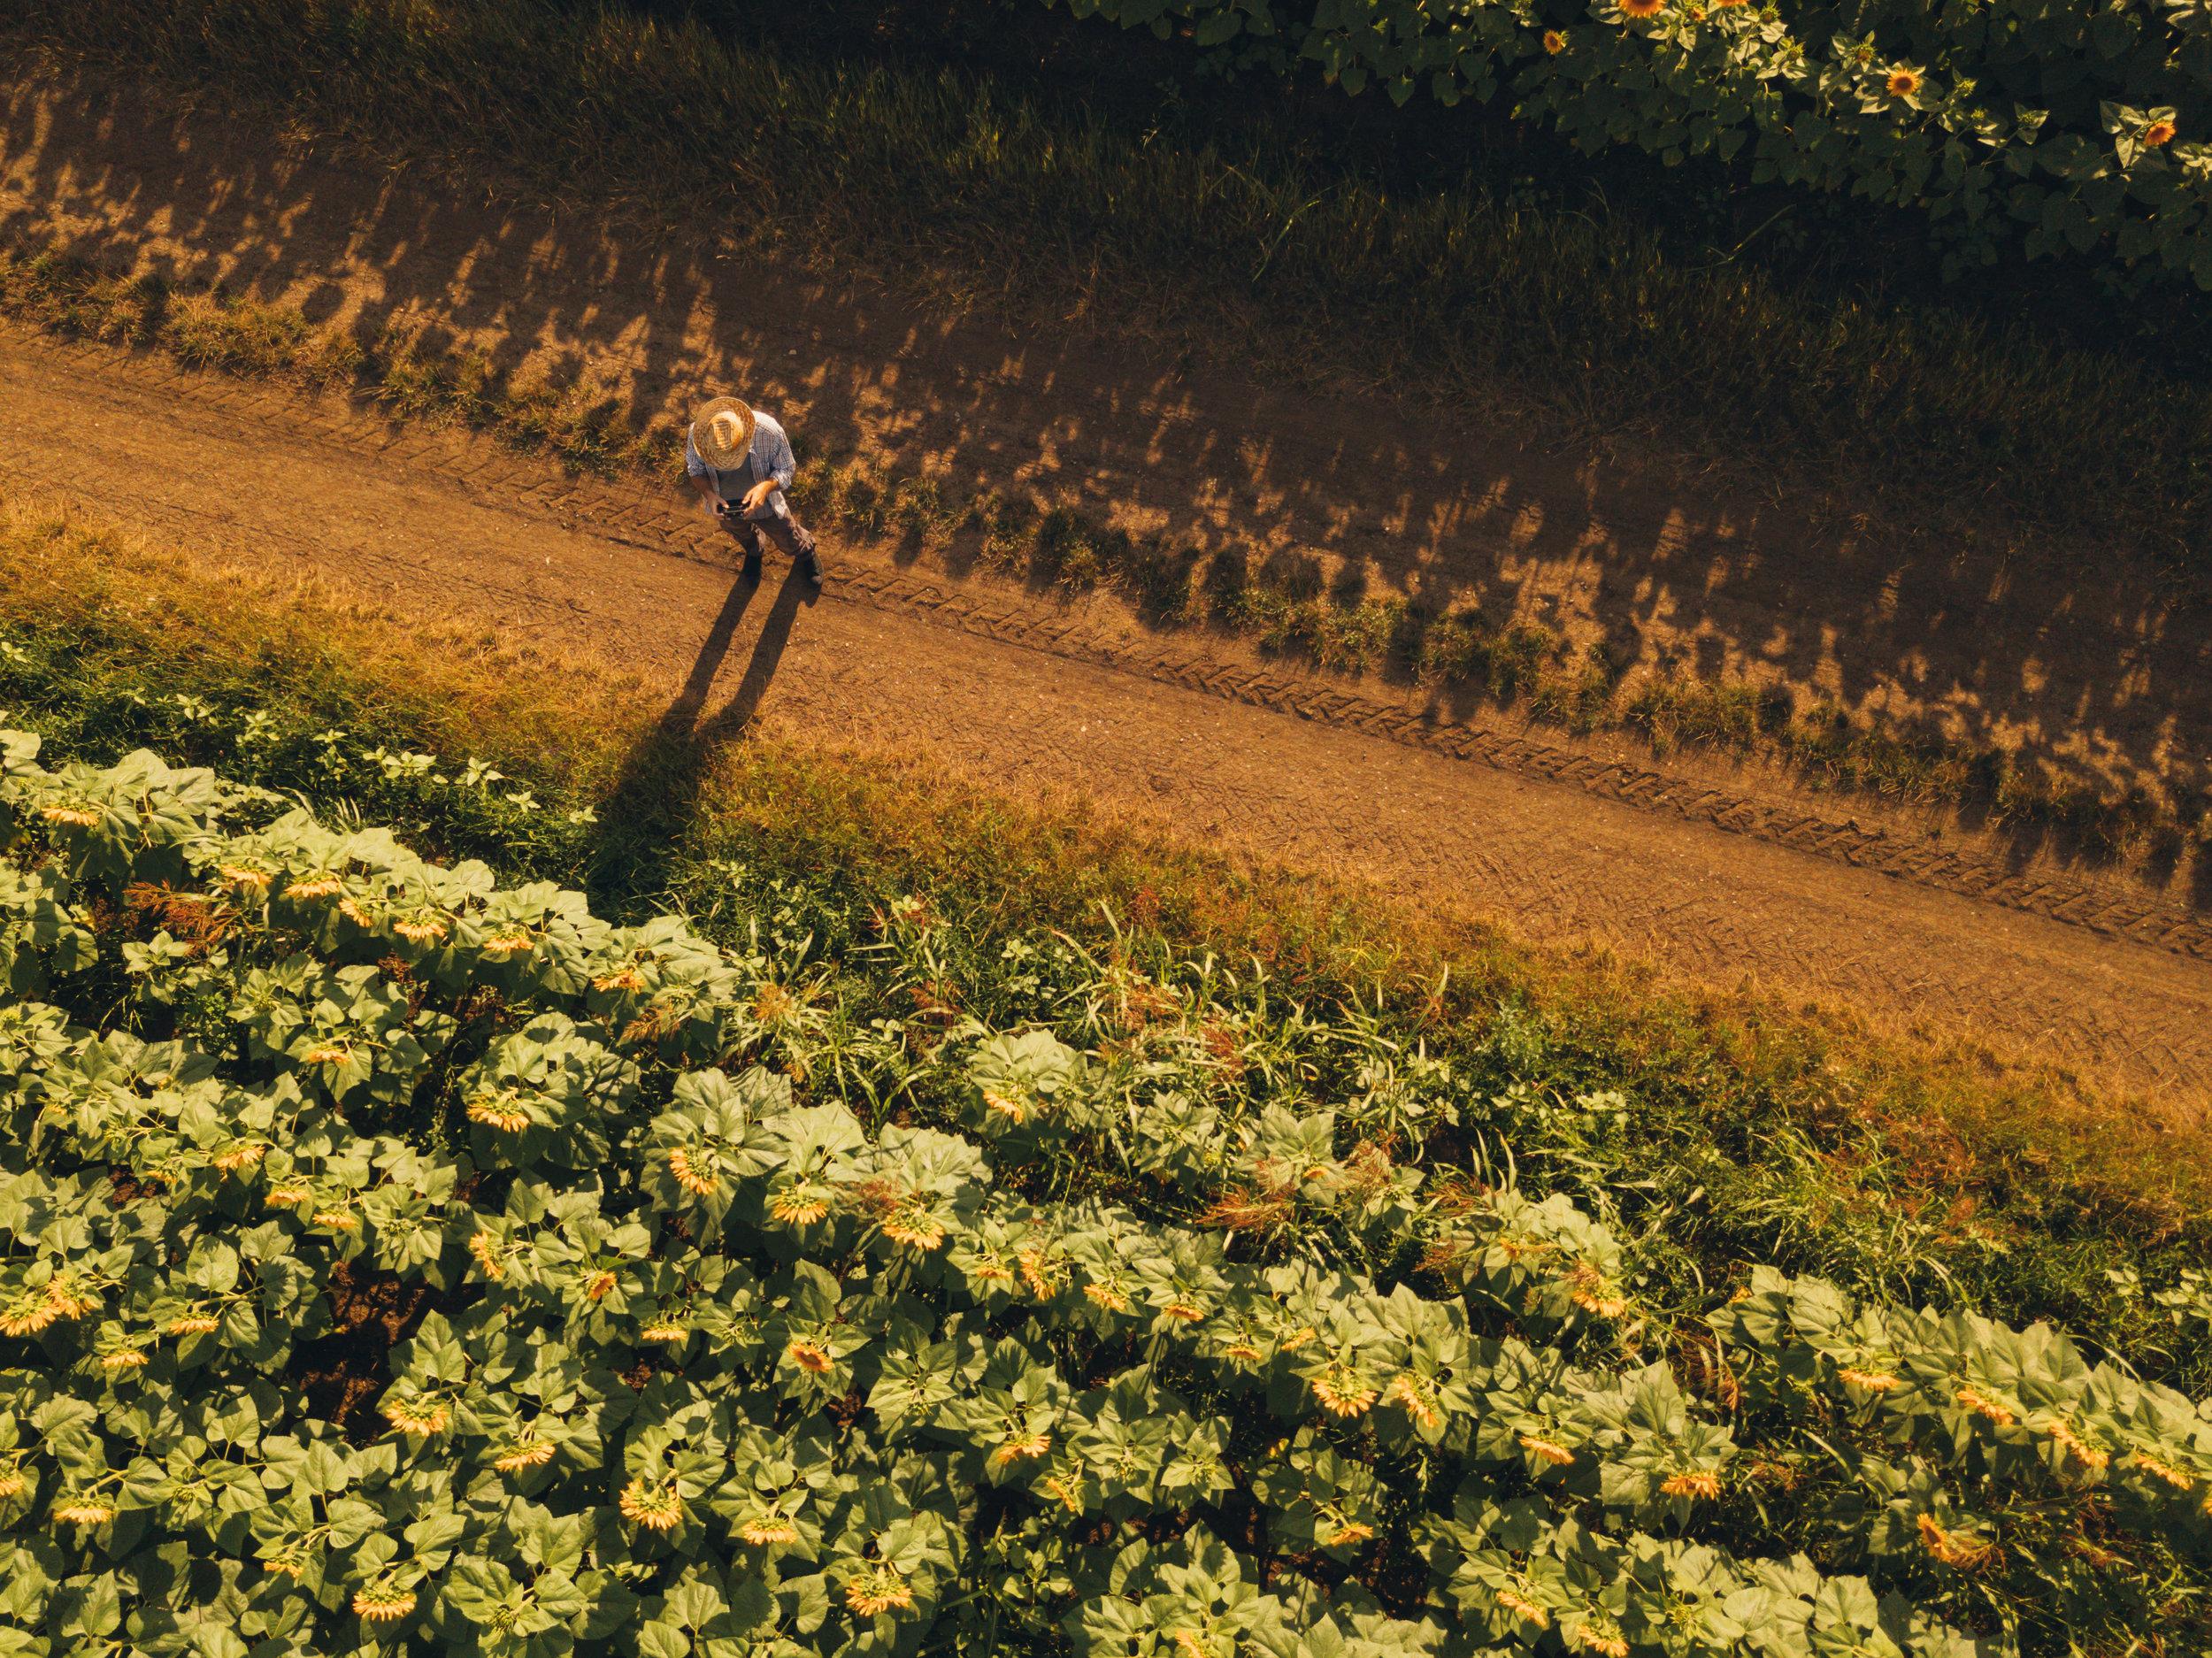 farmer-agronomist-using-drone-to-examine-SAEX2FN.jpg